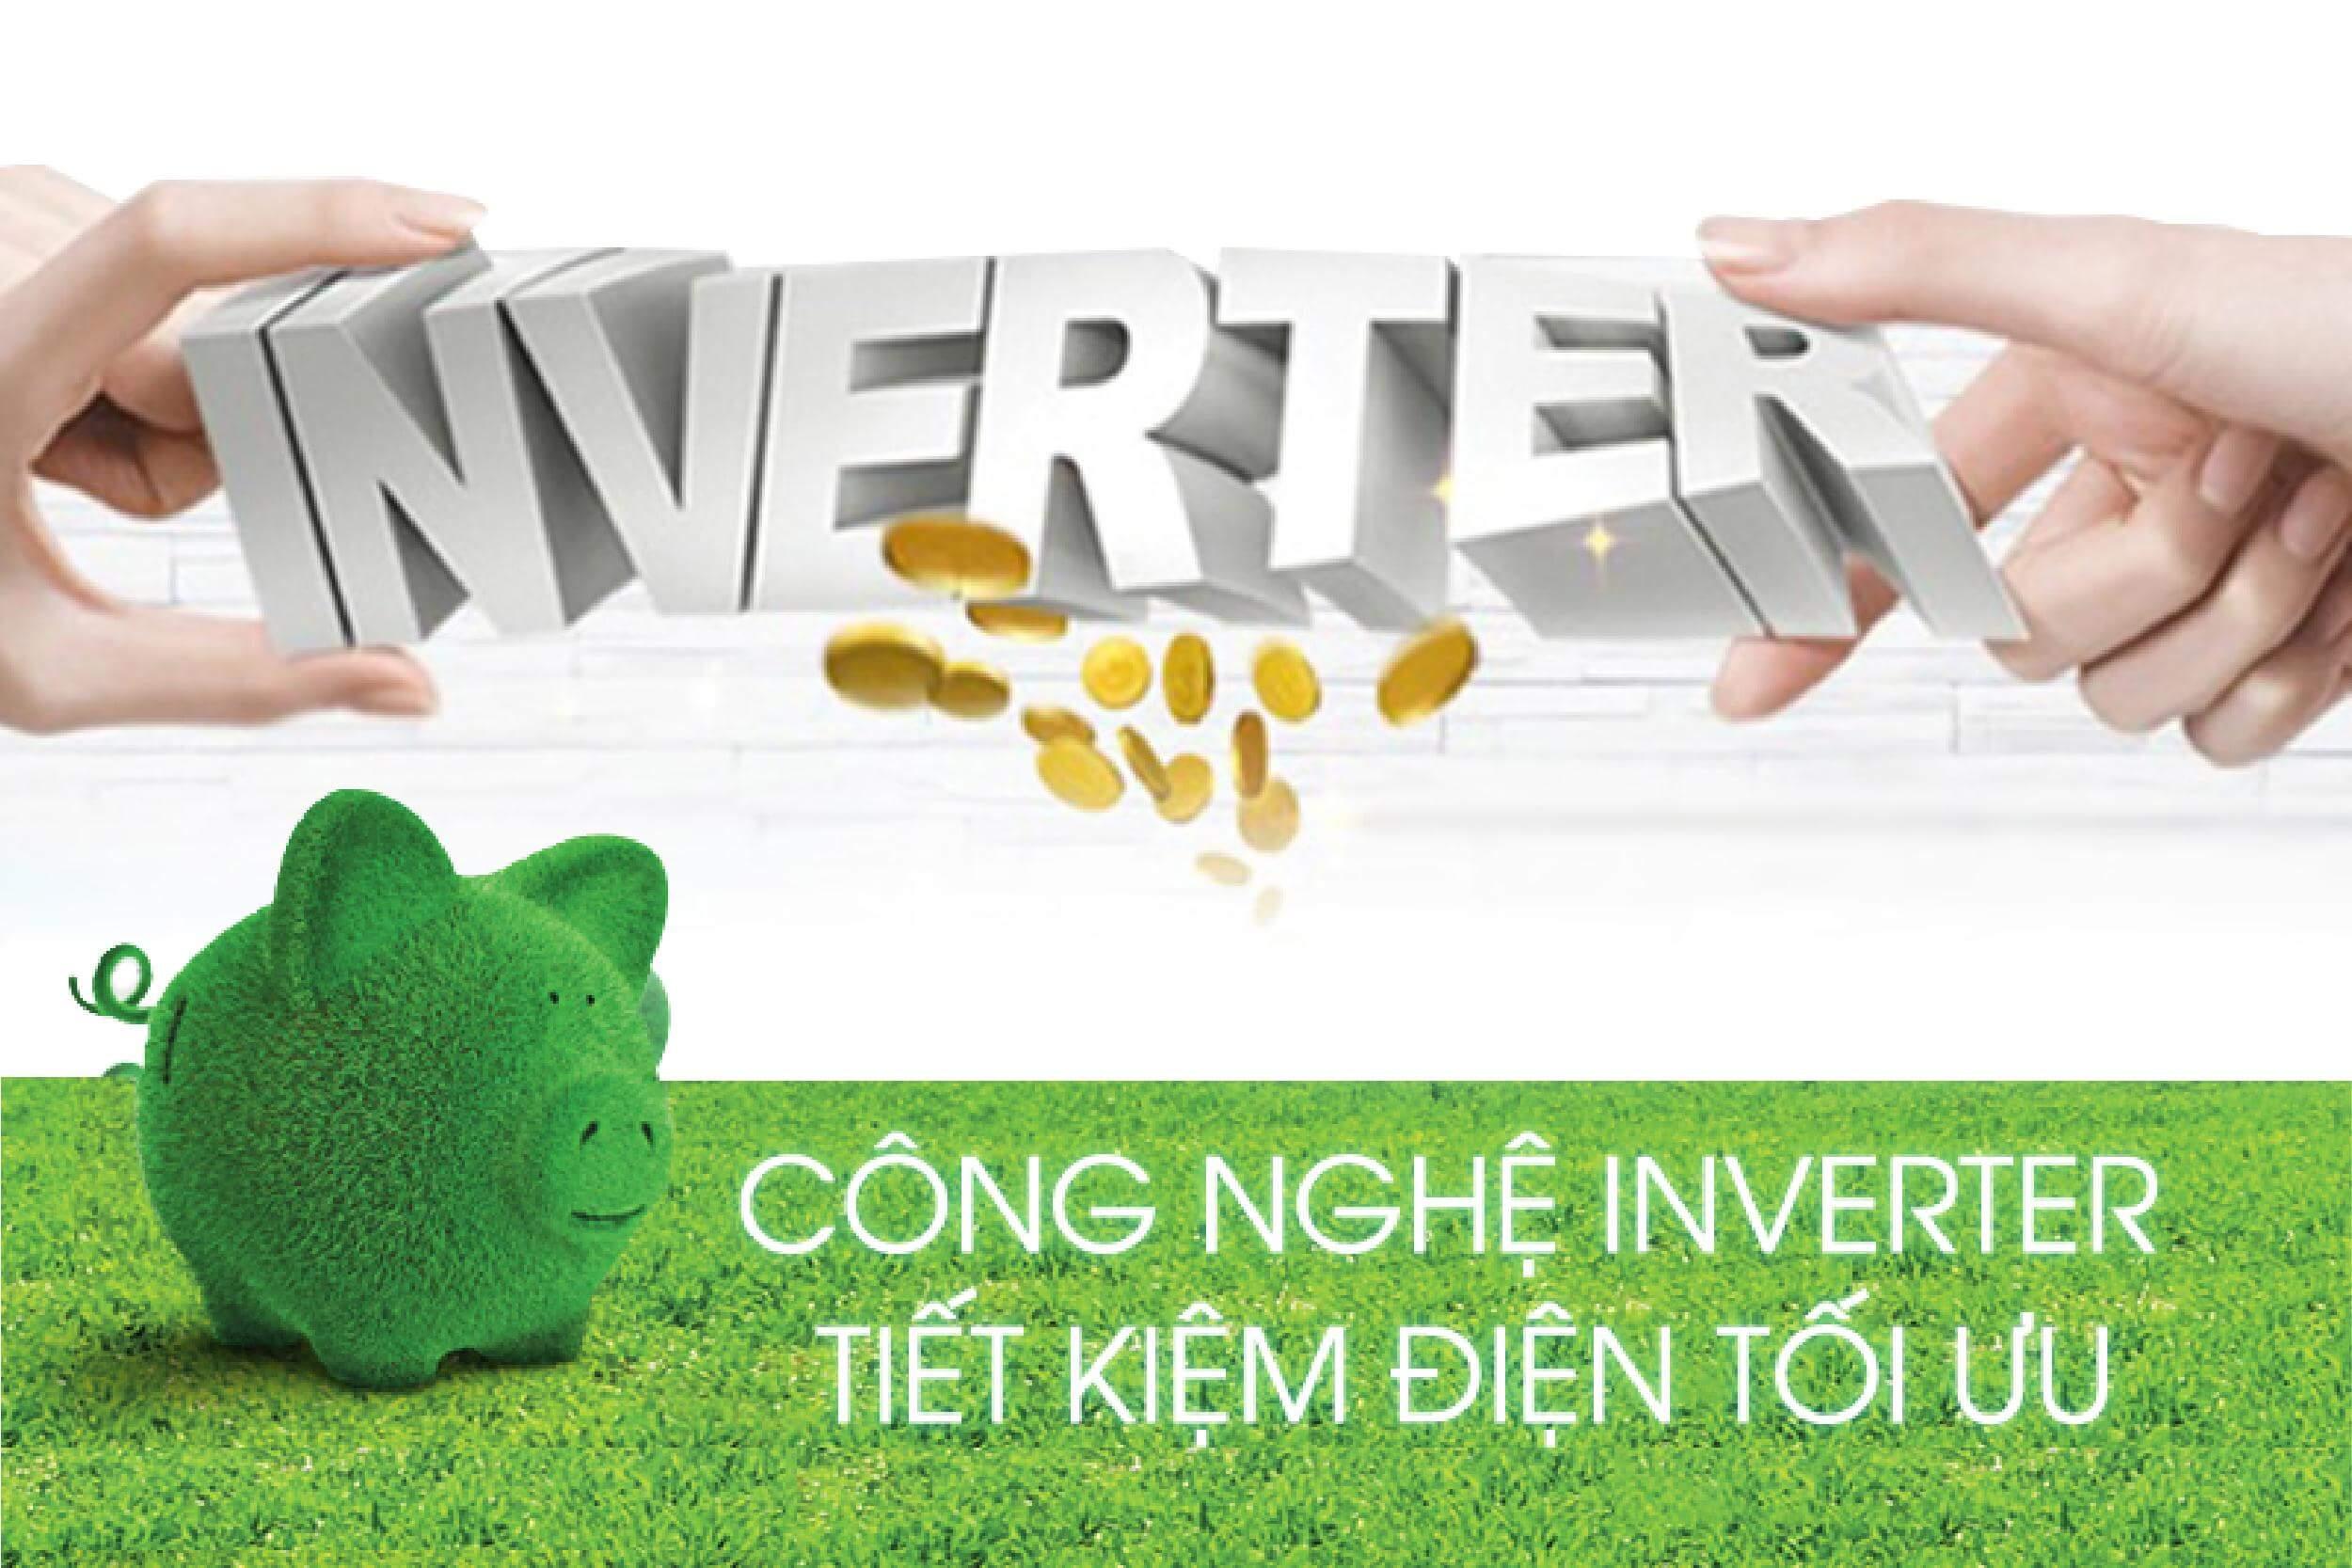 Inverter Cong Nghe